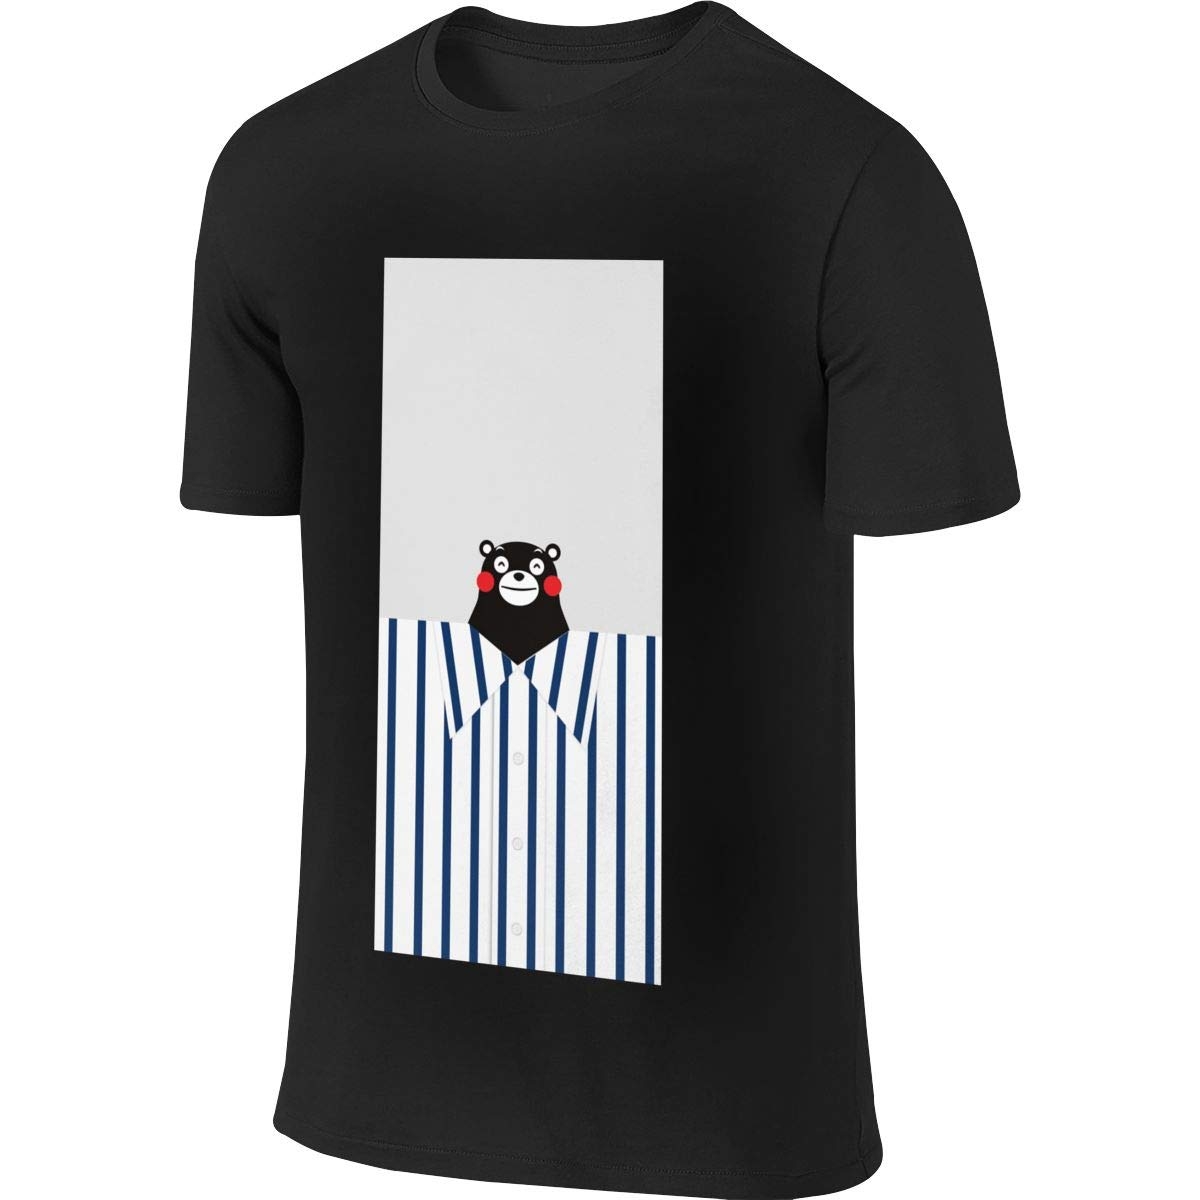 Stdone S Design Fashion Tees Kumamon Tshirts